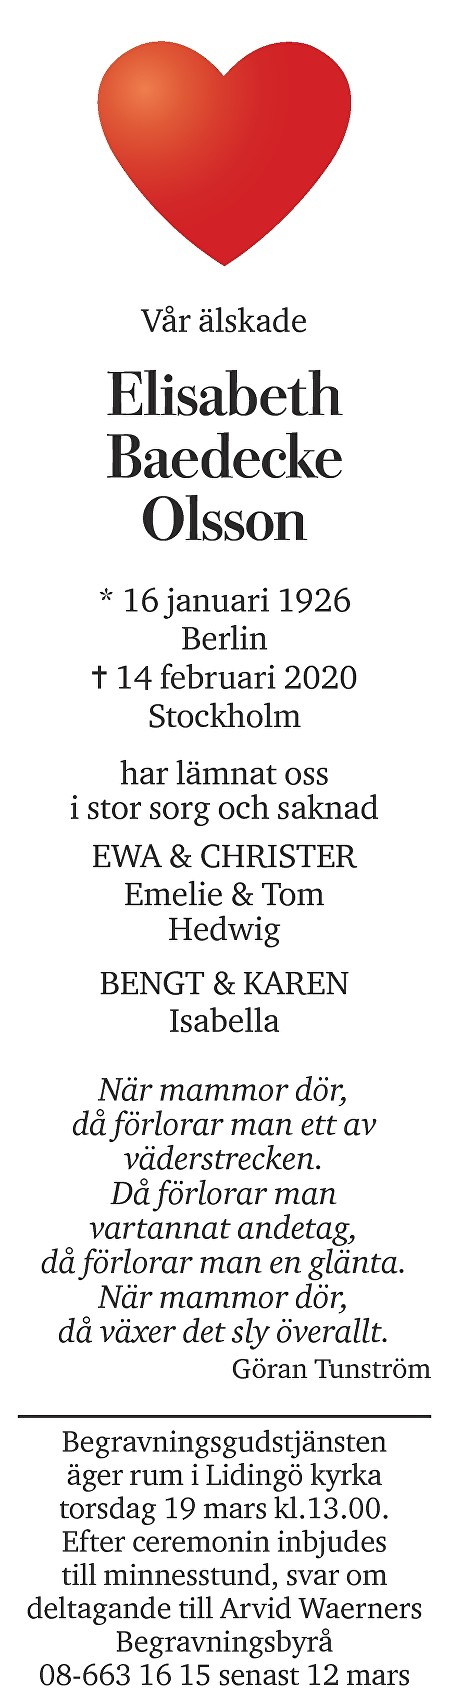 Elisabeth Baedecke-Olsson Death notice